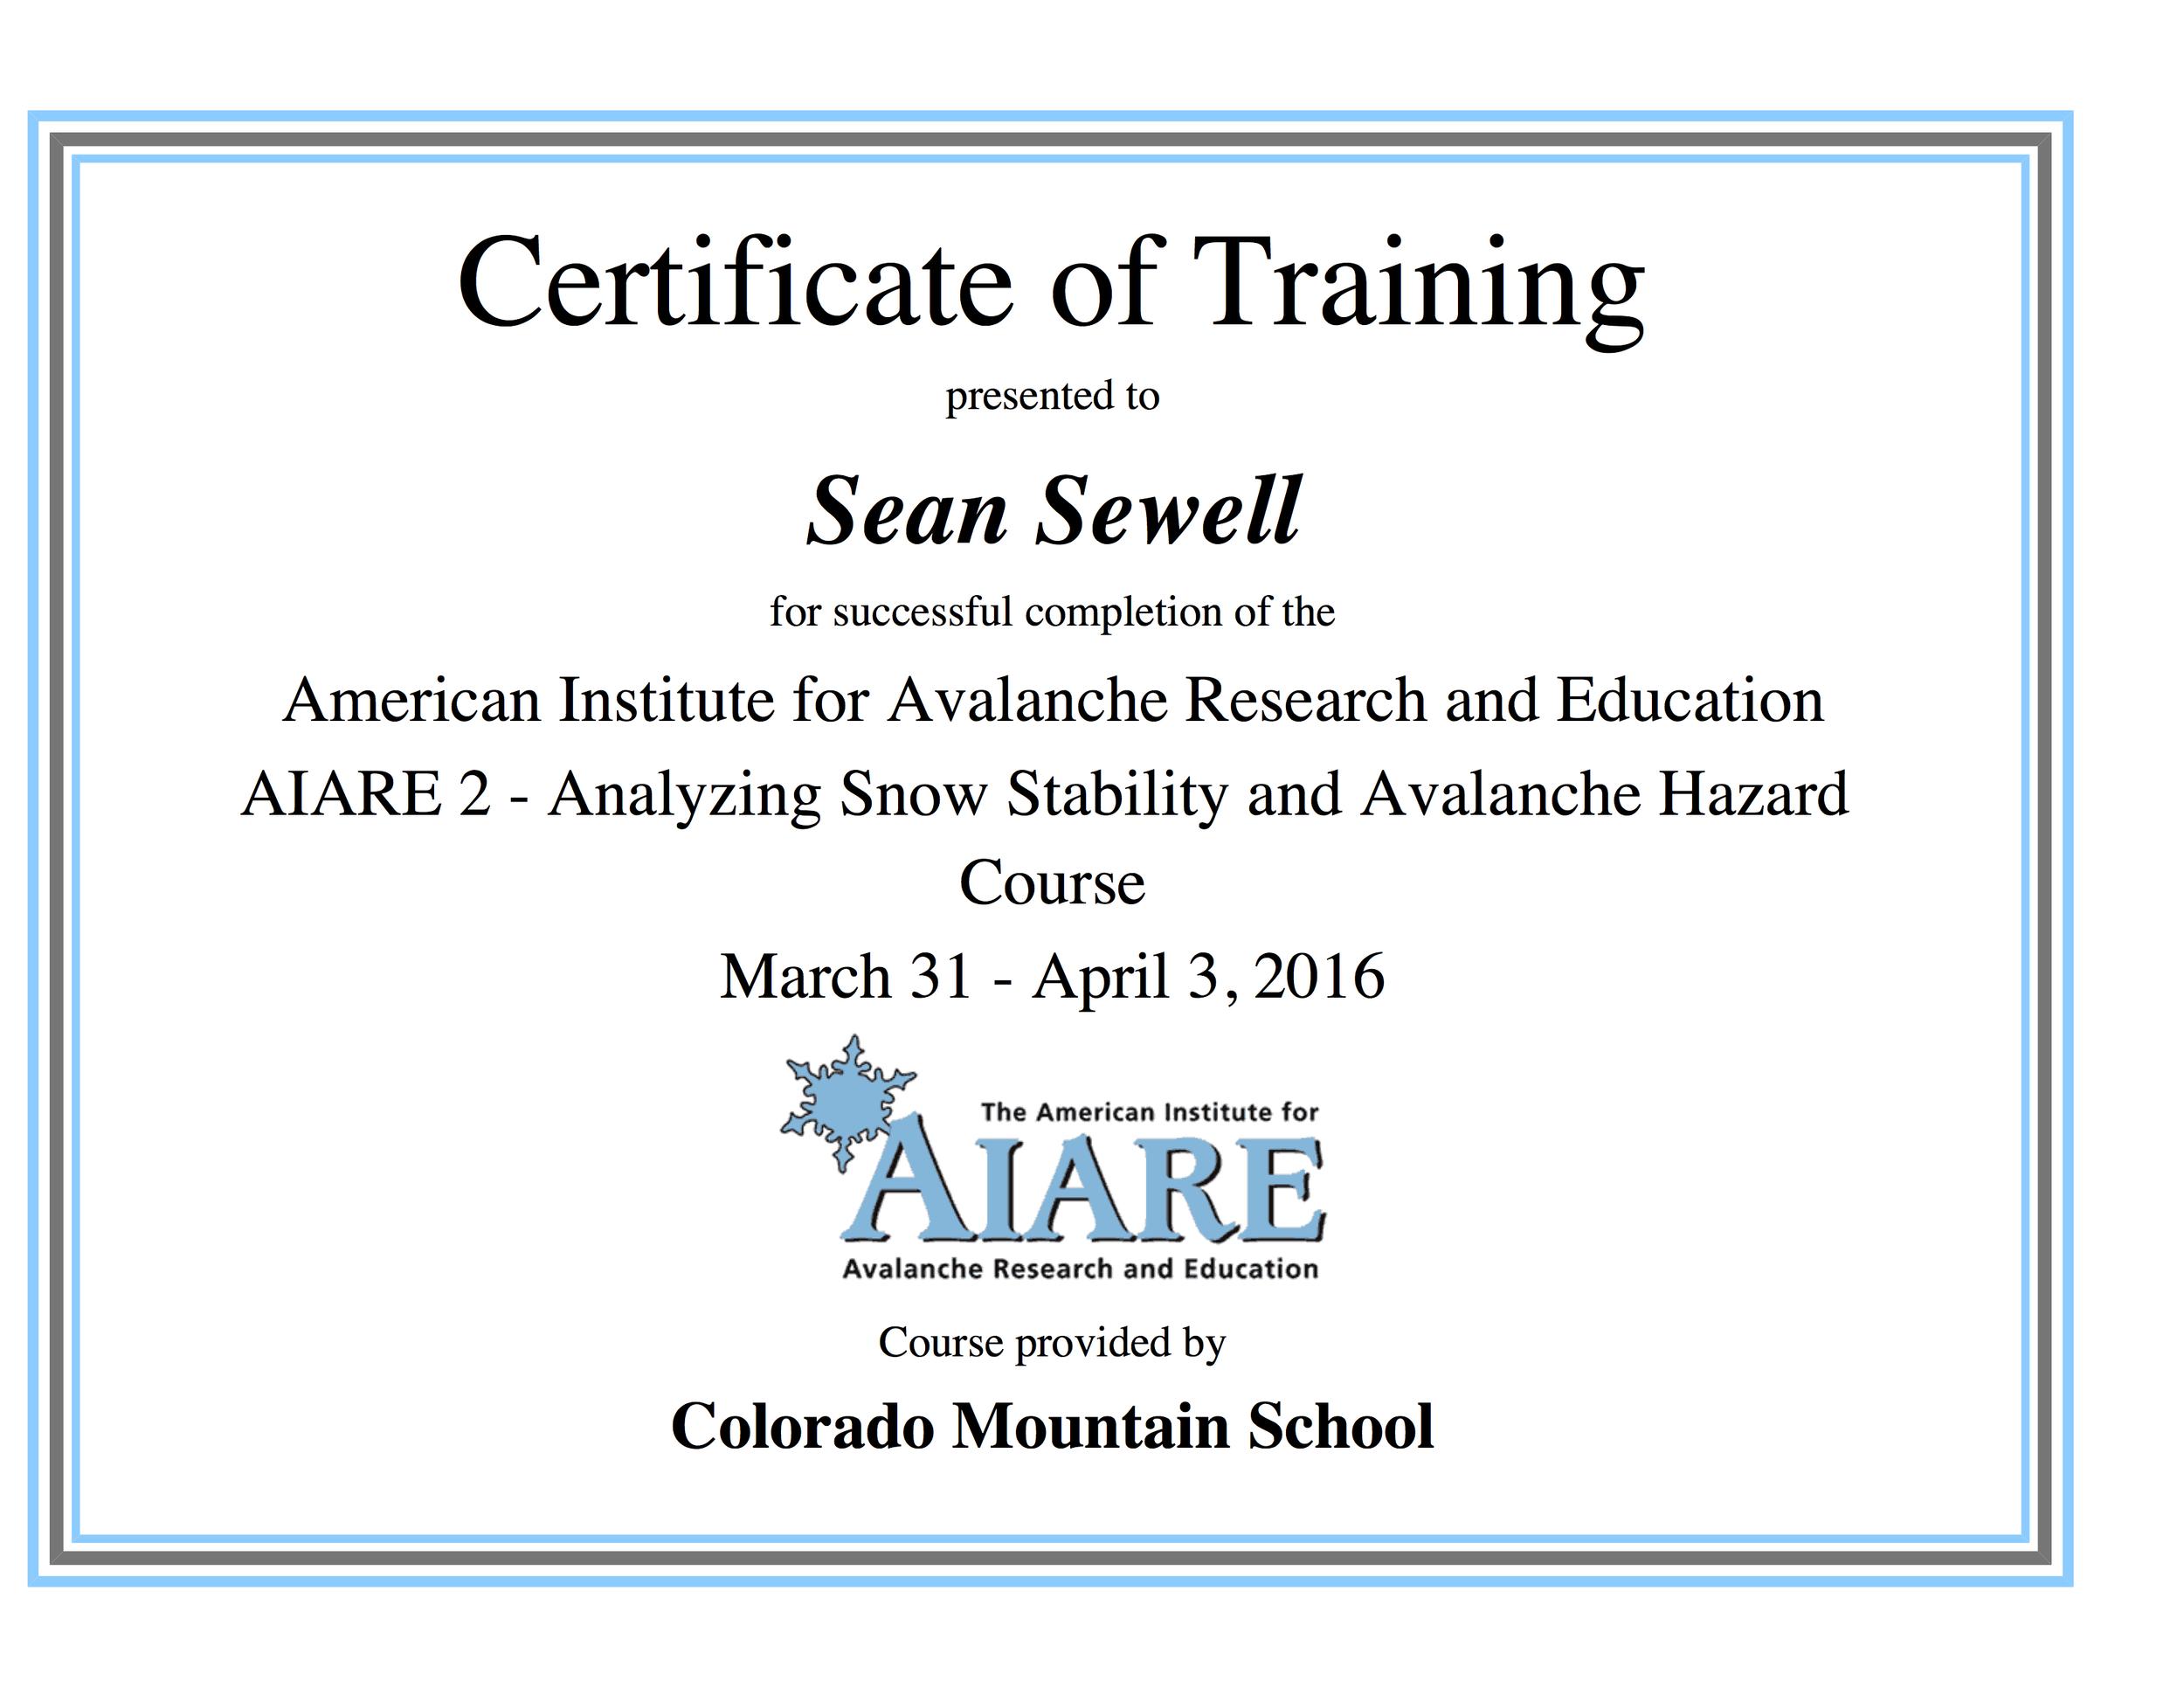 AIARE_Class_Cert_Sean Sewell.jpg